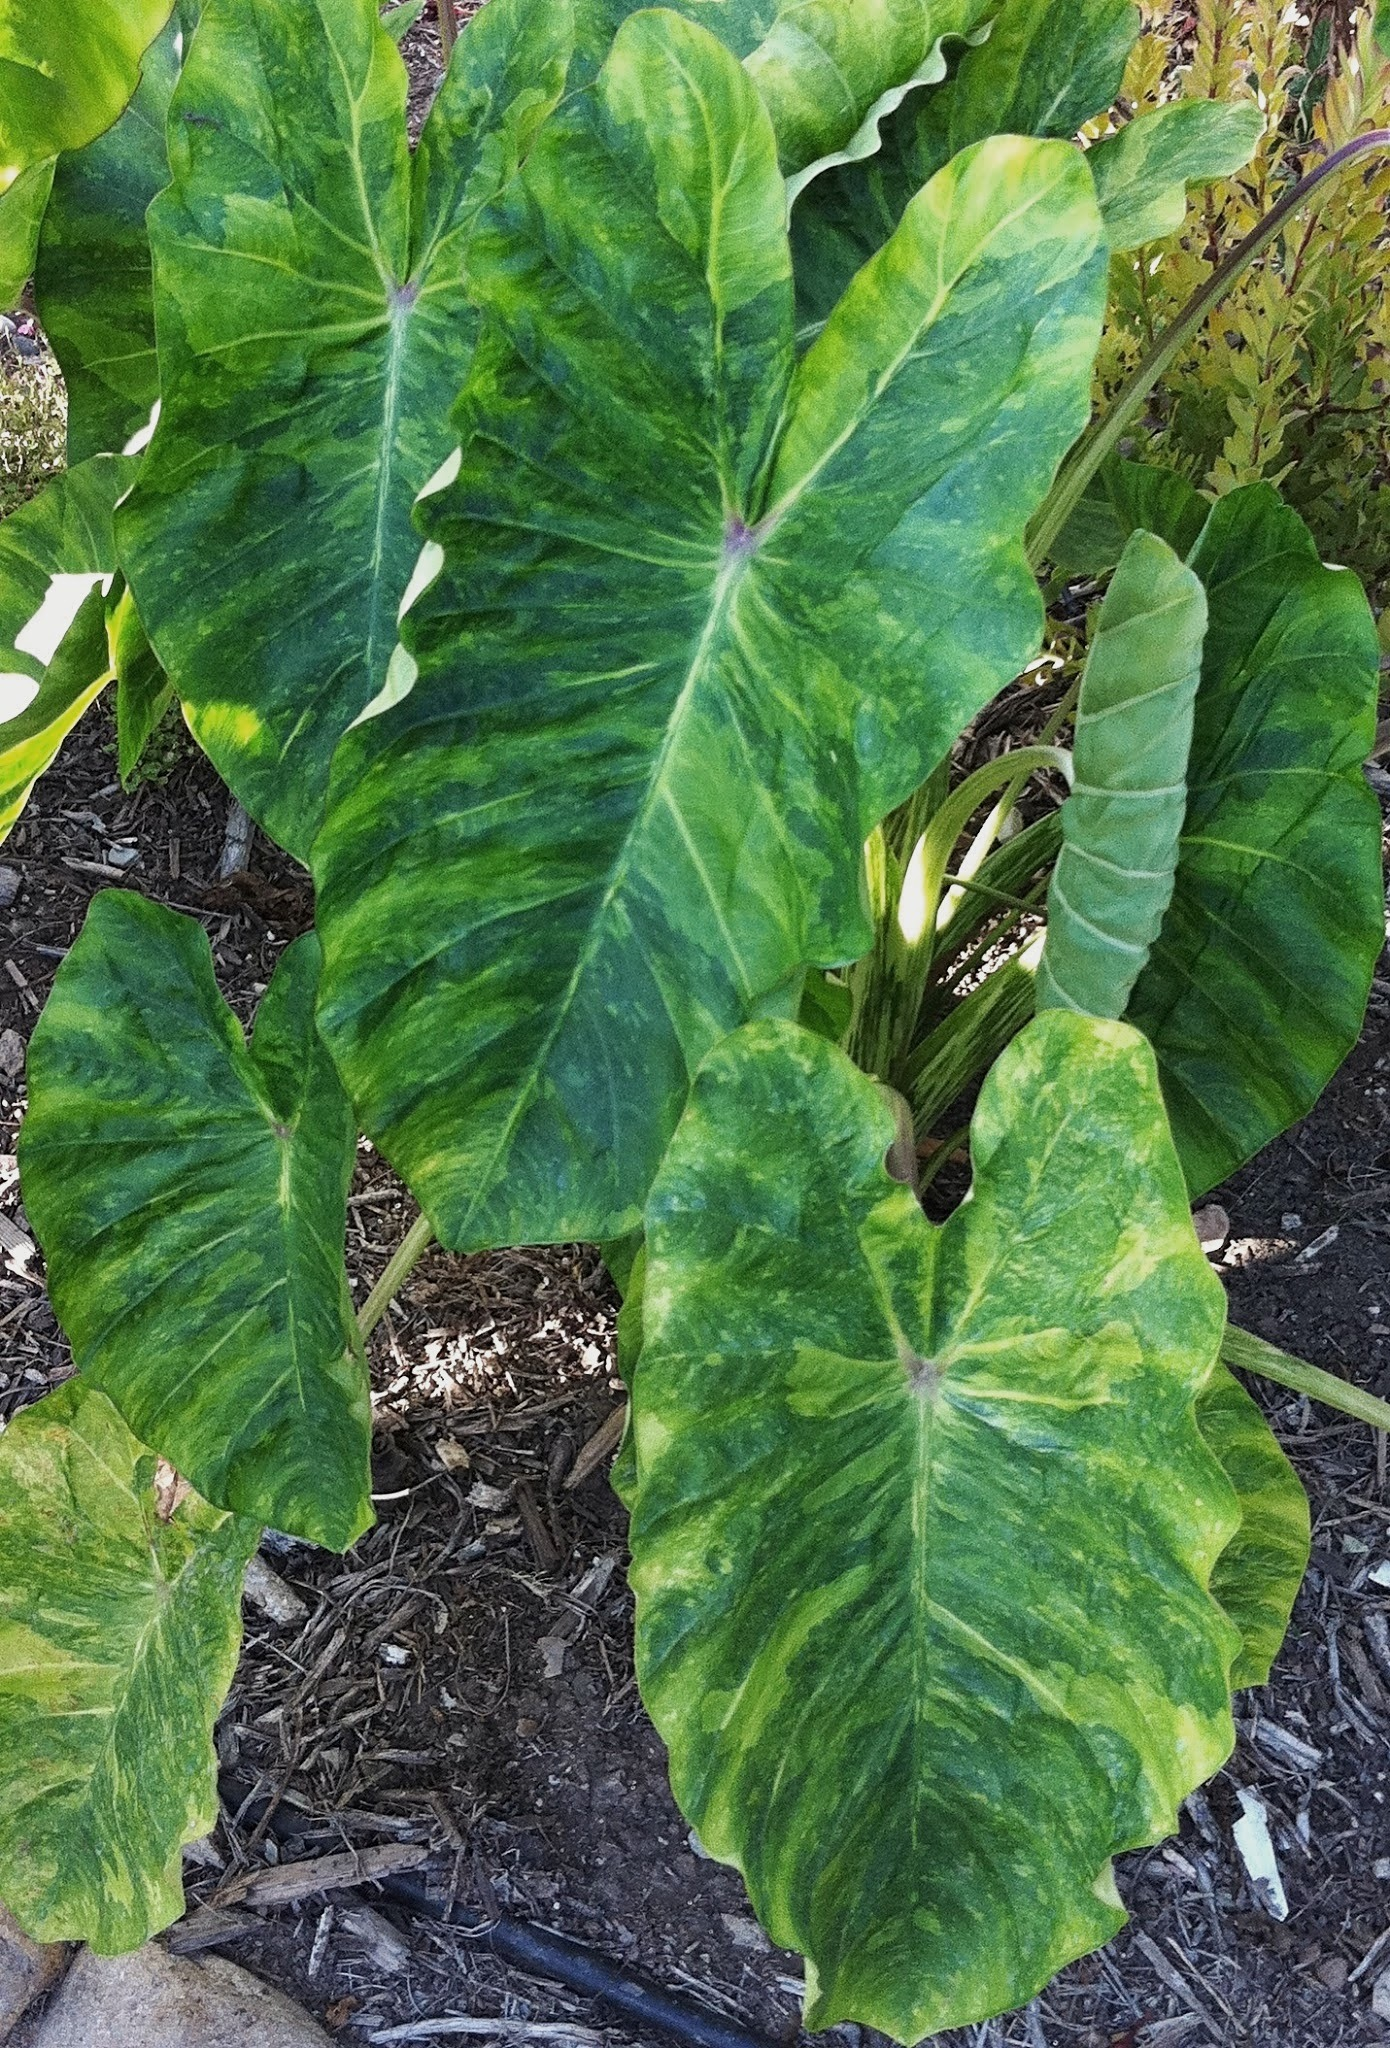 Colocasia esculenta 'Morning Dew' PP 26,865 @ California - a 2014 John Cho introduction